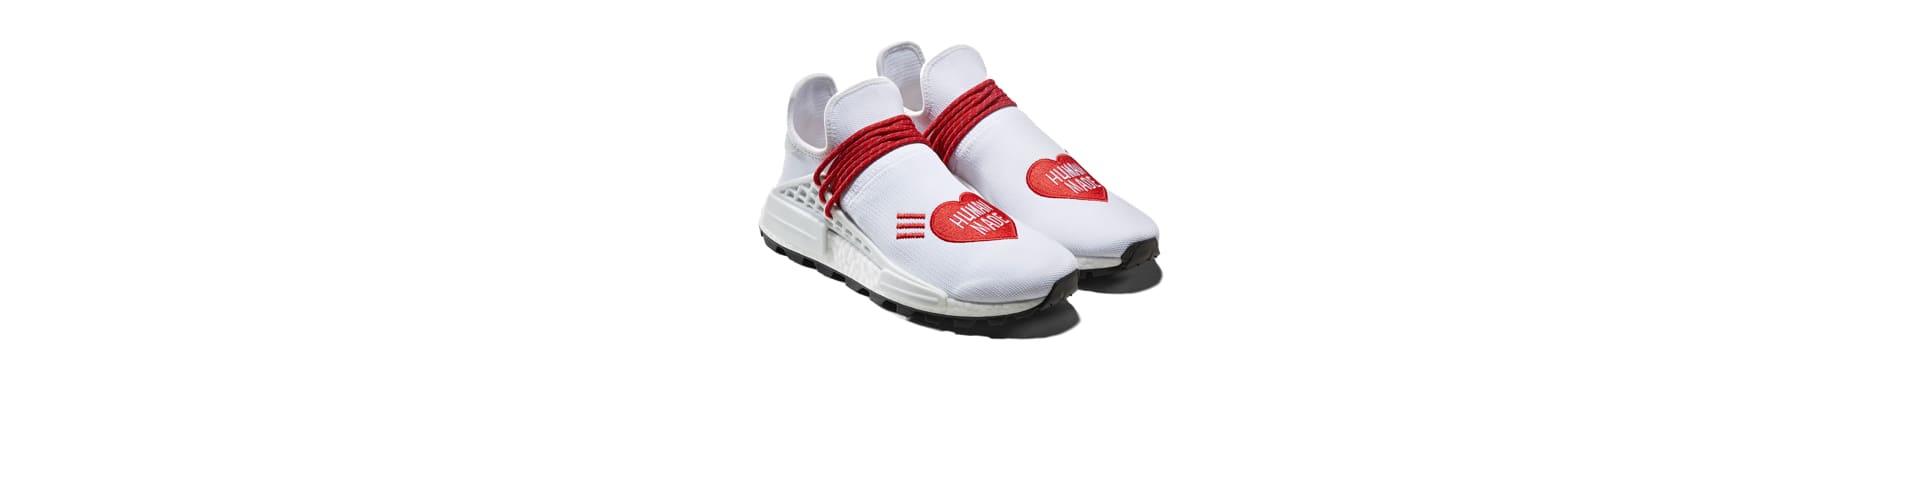 adidas by Pharrell Williams adidas SE    adidas av Pharrell Williams   title=          adidas SE